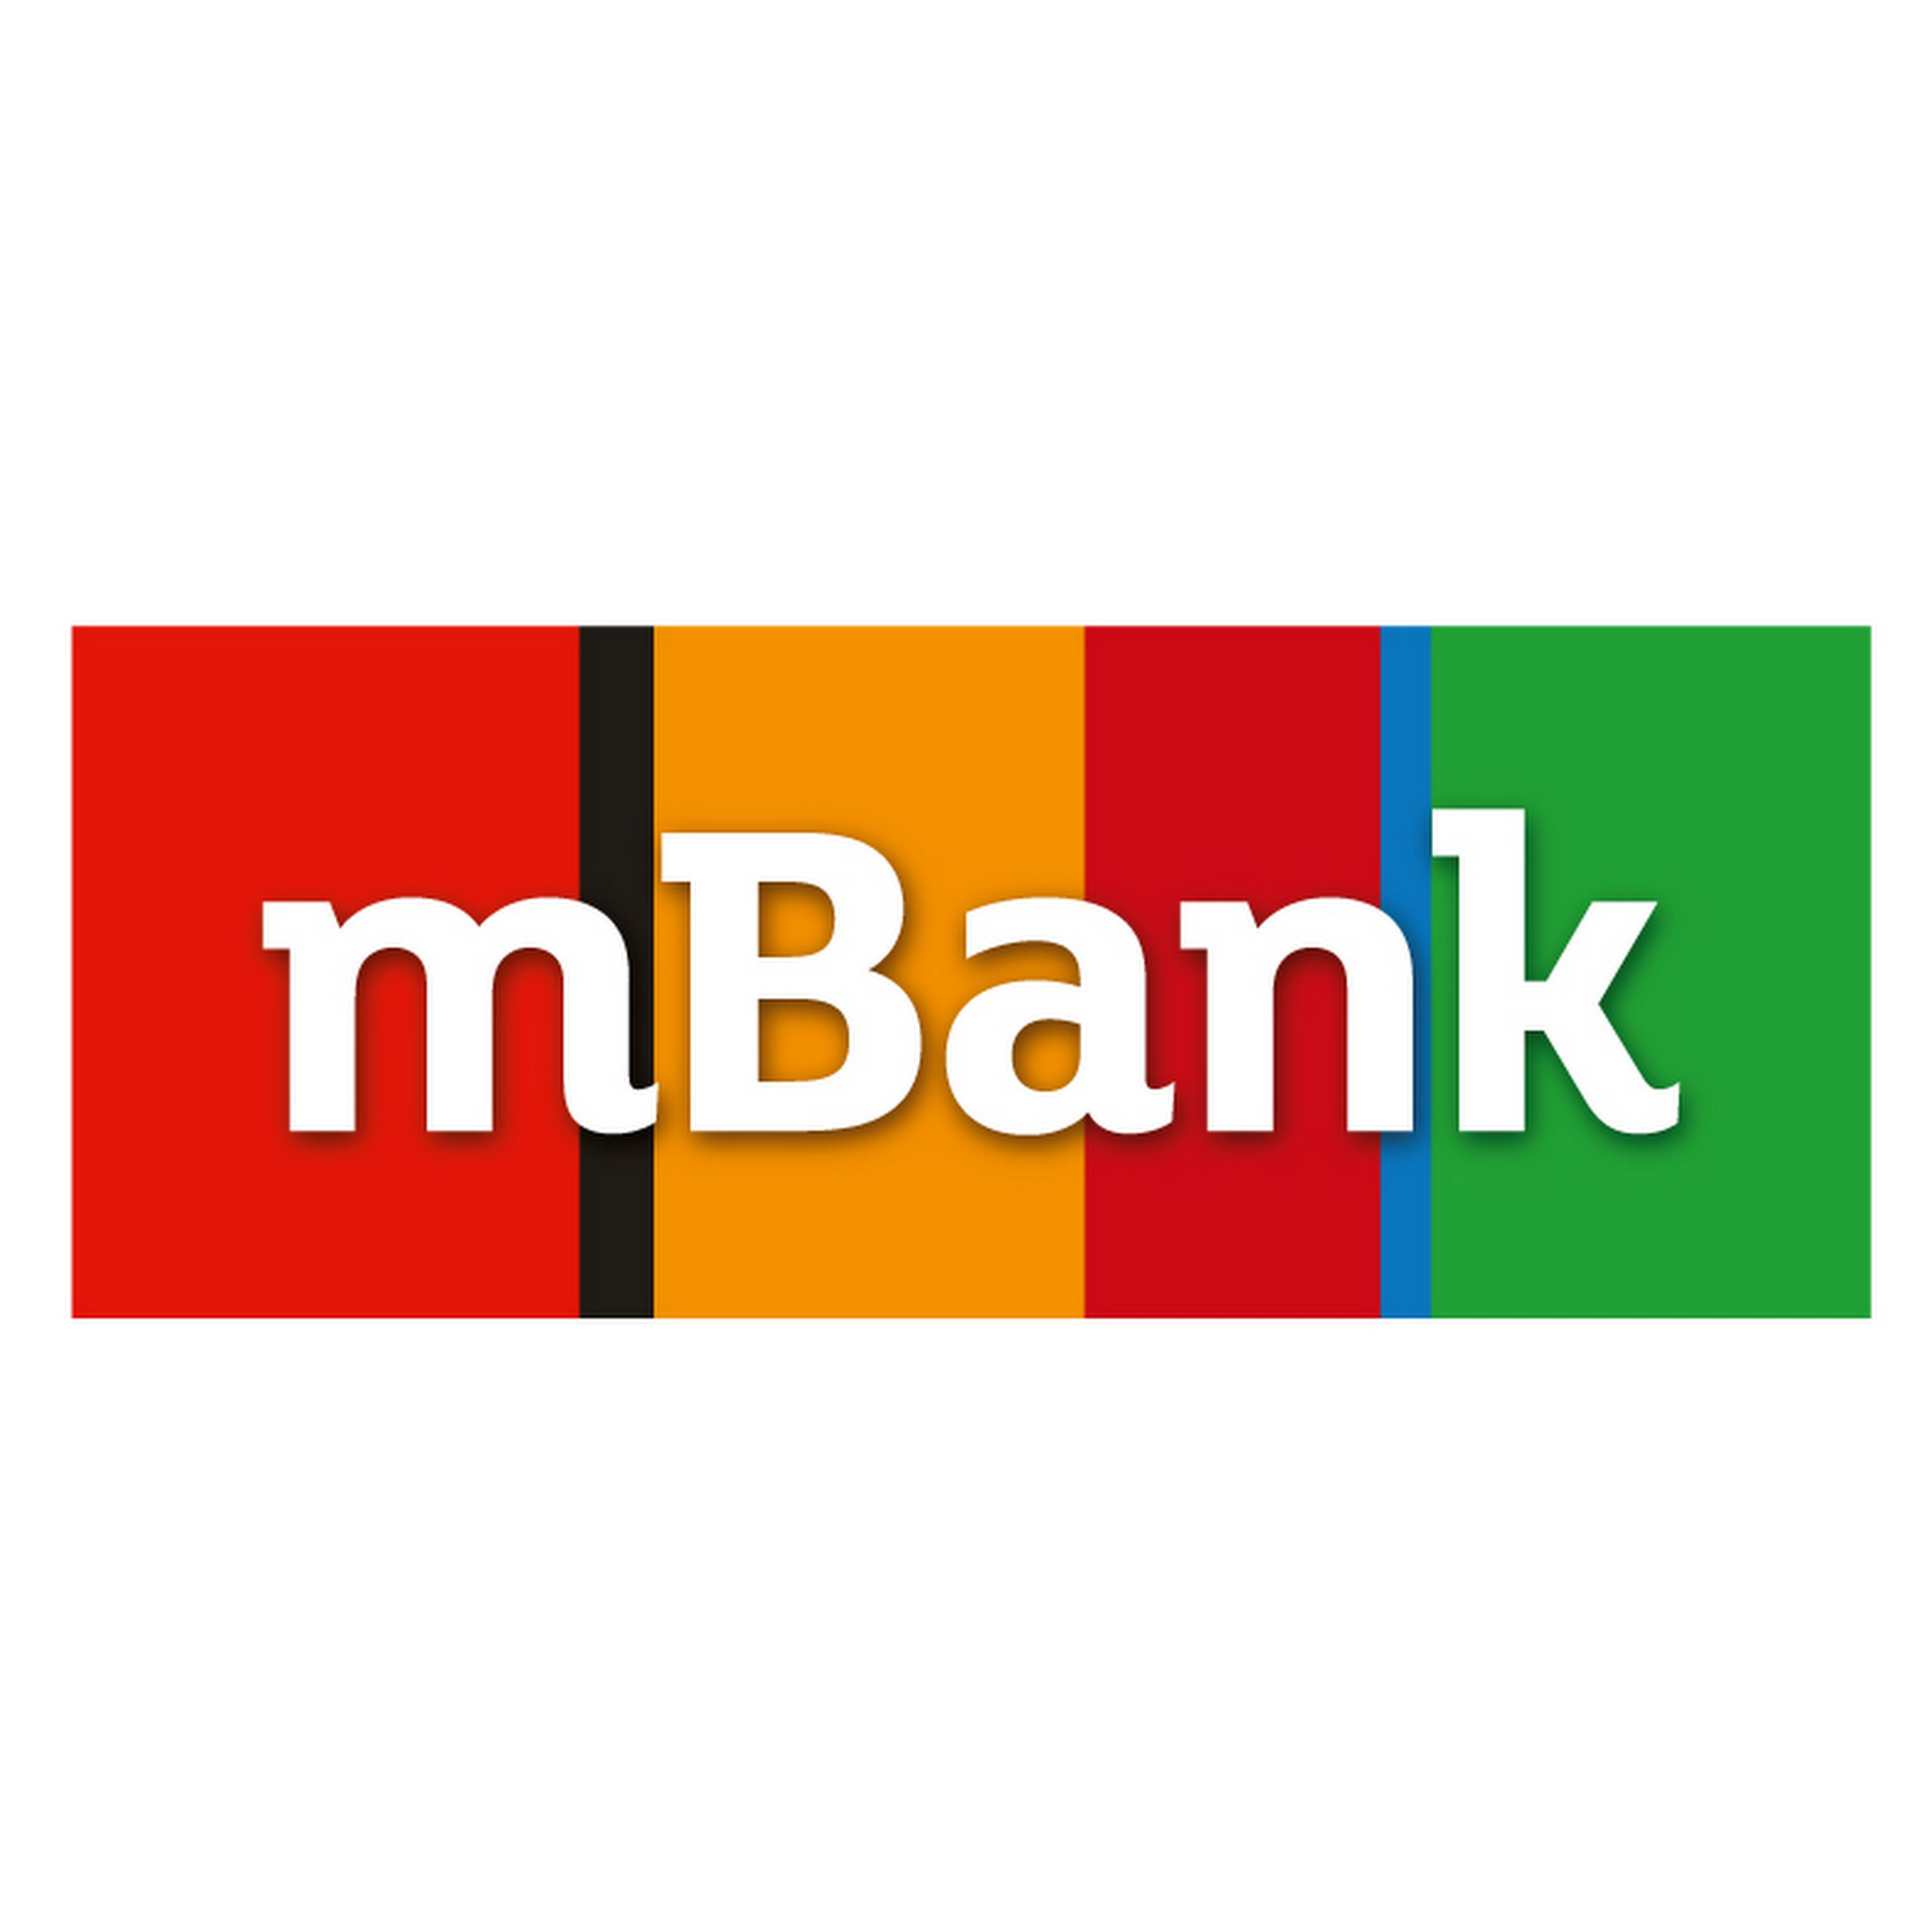 Grupa mBank zakończyła przetarg mBank mediarun com logo mbank